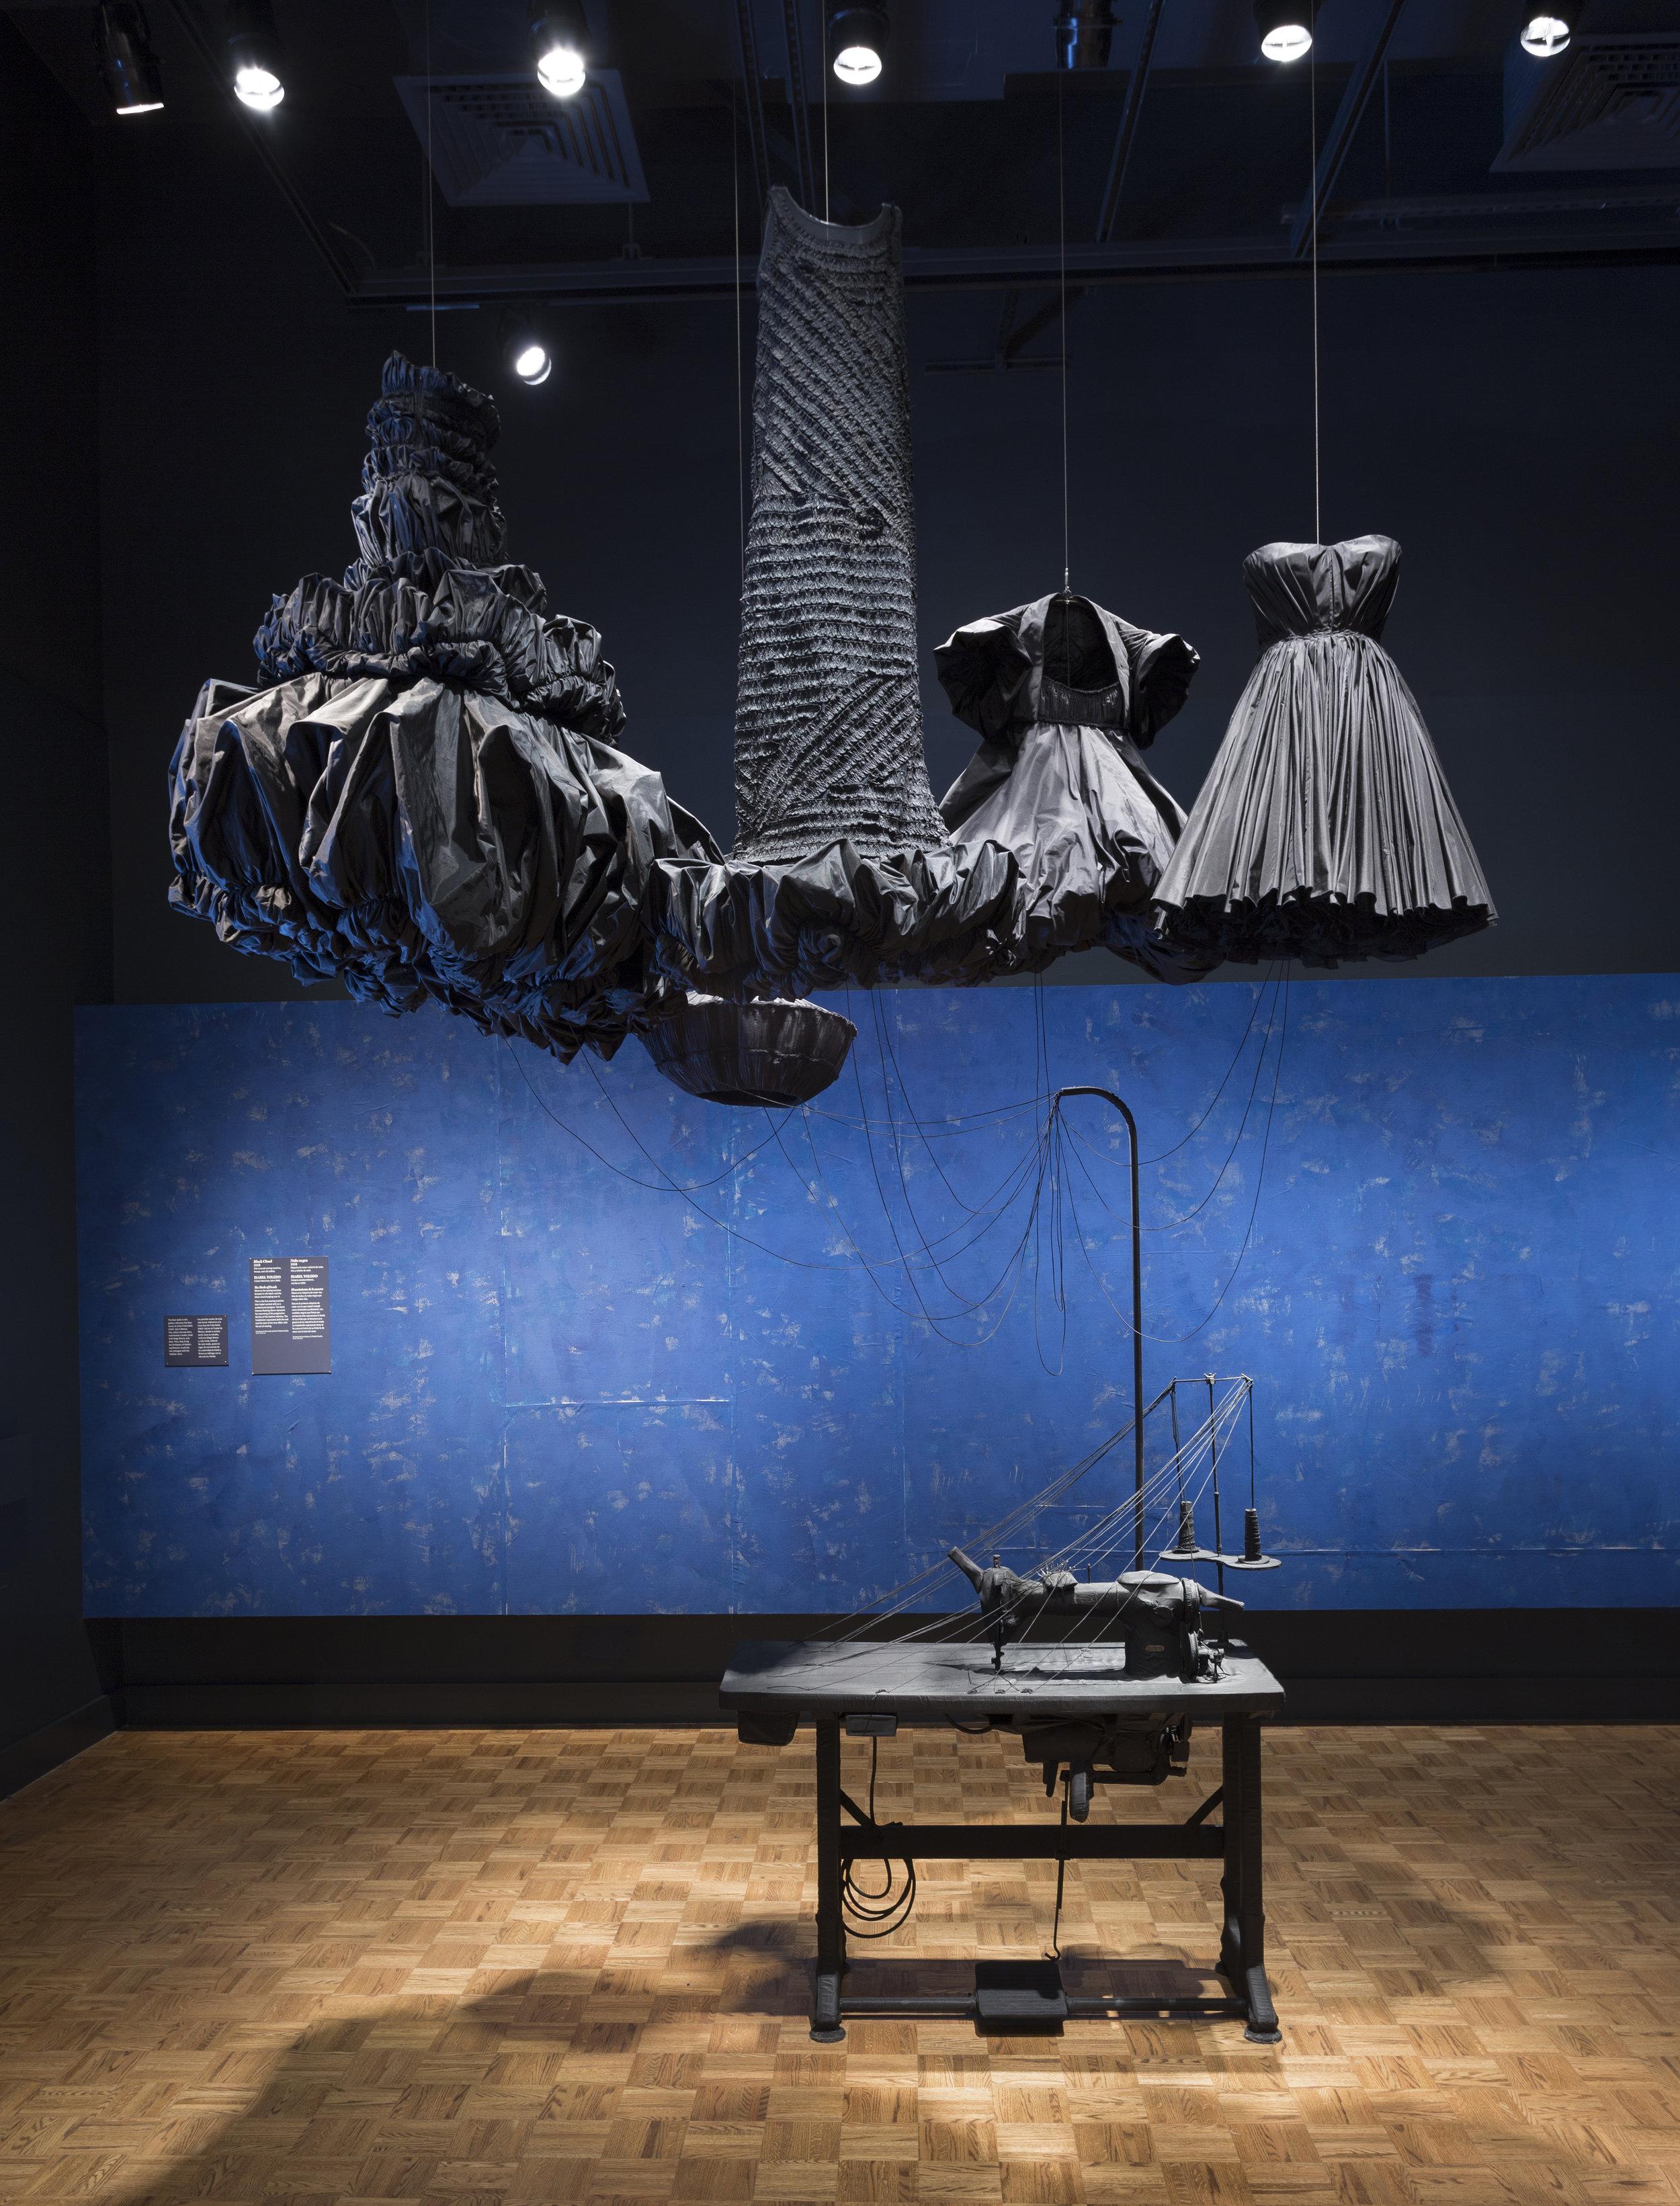 Black Cloud , 2018, Silk-covered sewing machine, thread, and silk taffeta, Photo Credit © Detroit Institute of Arts